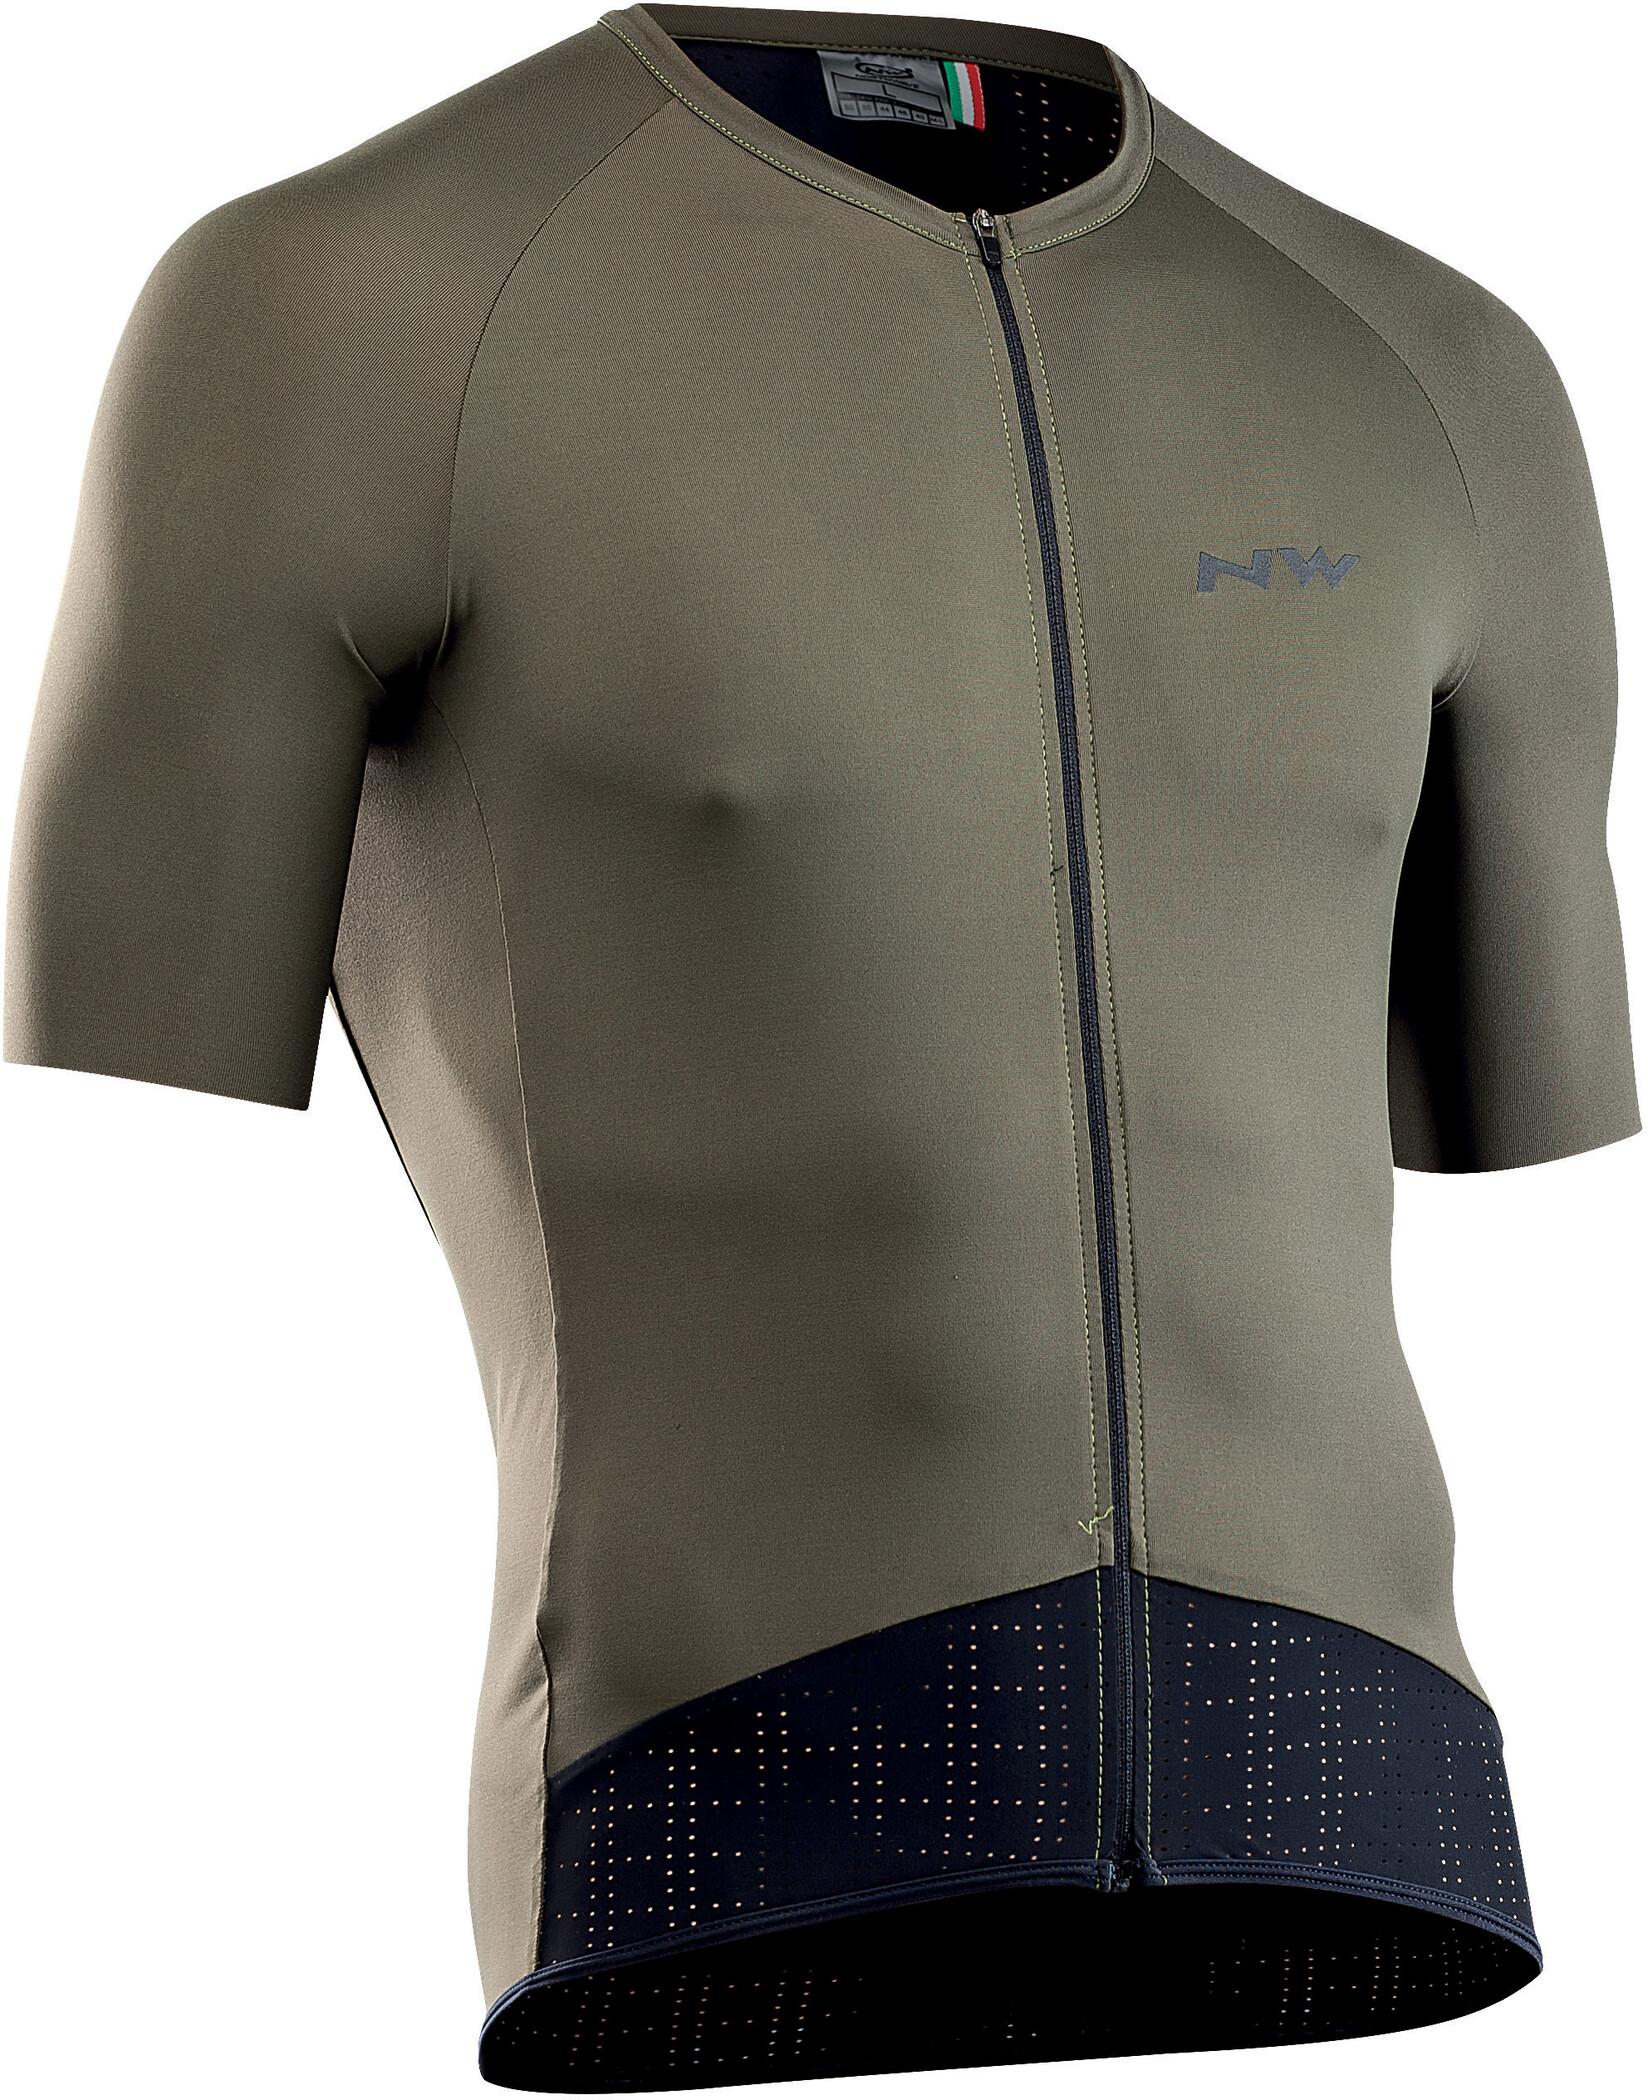 Shimano  2018 XTR  Hoody Fishing Leisure Clothing XXXL Pullover  S